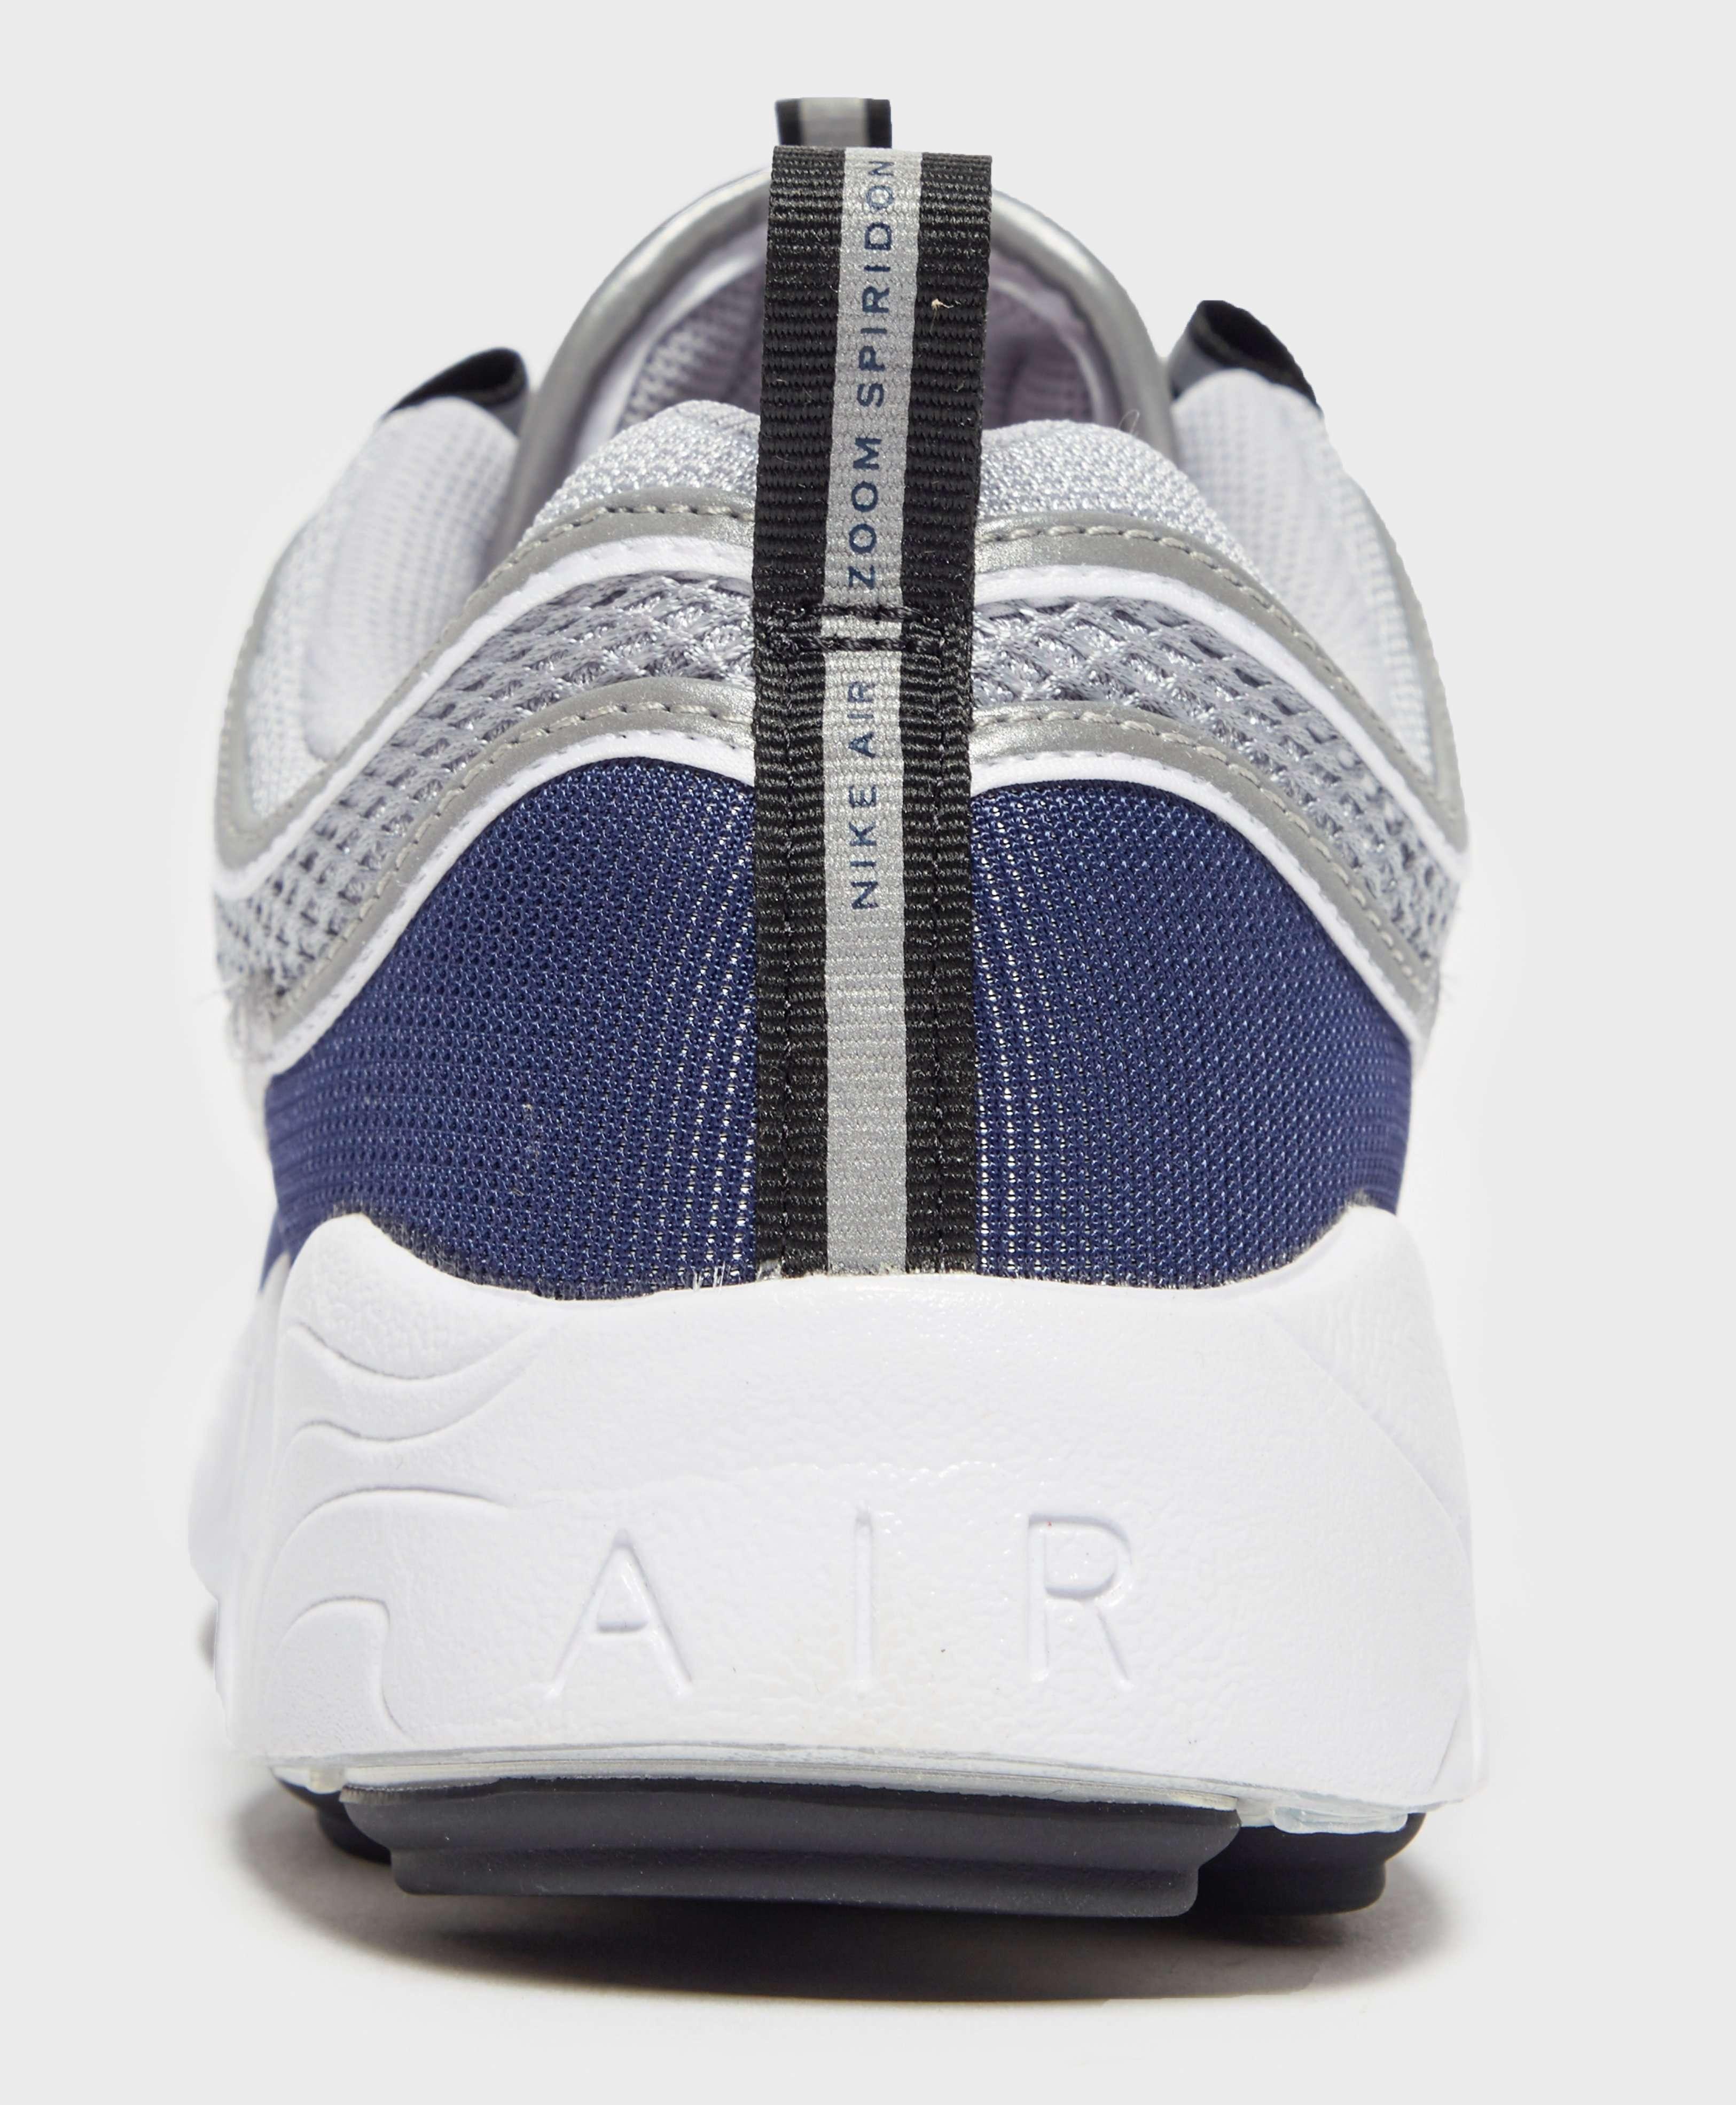 Nike Spiridon